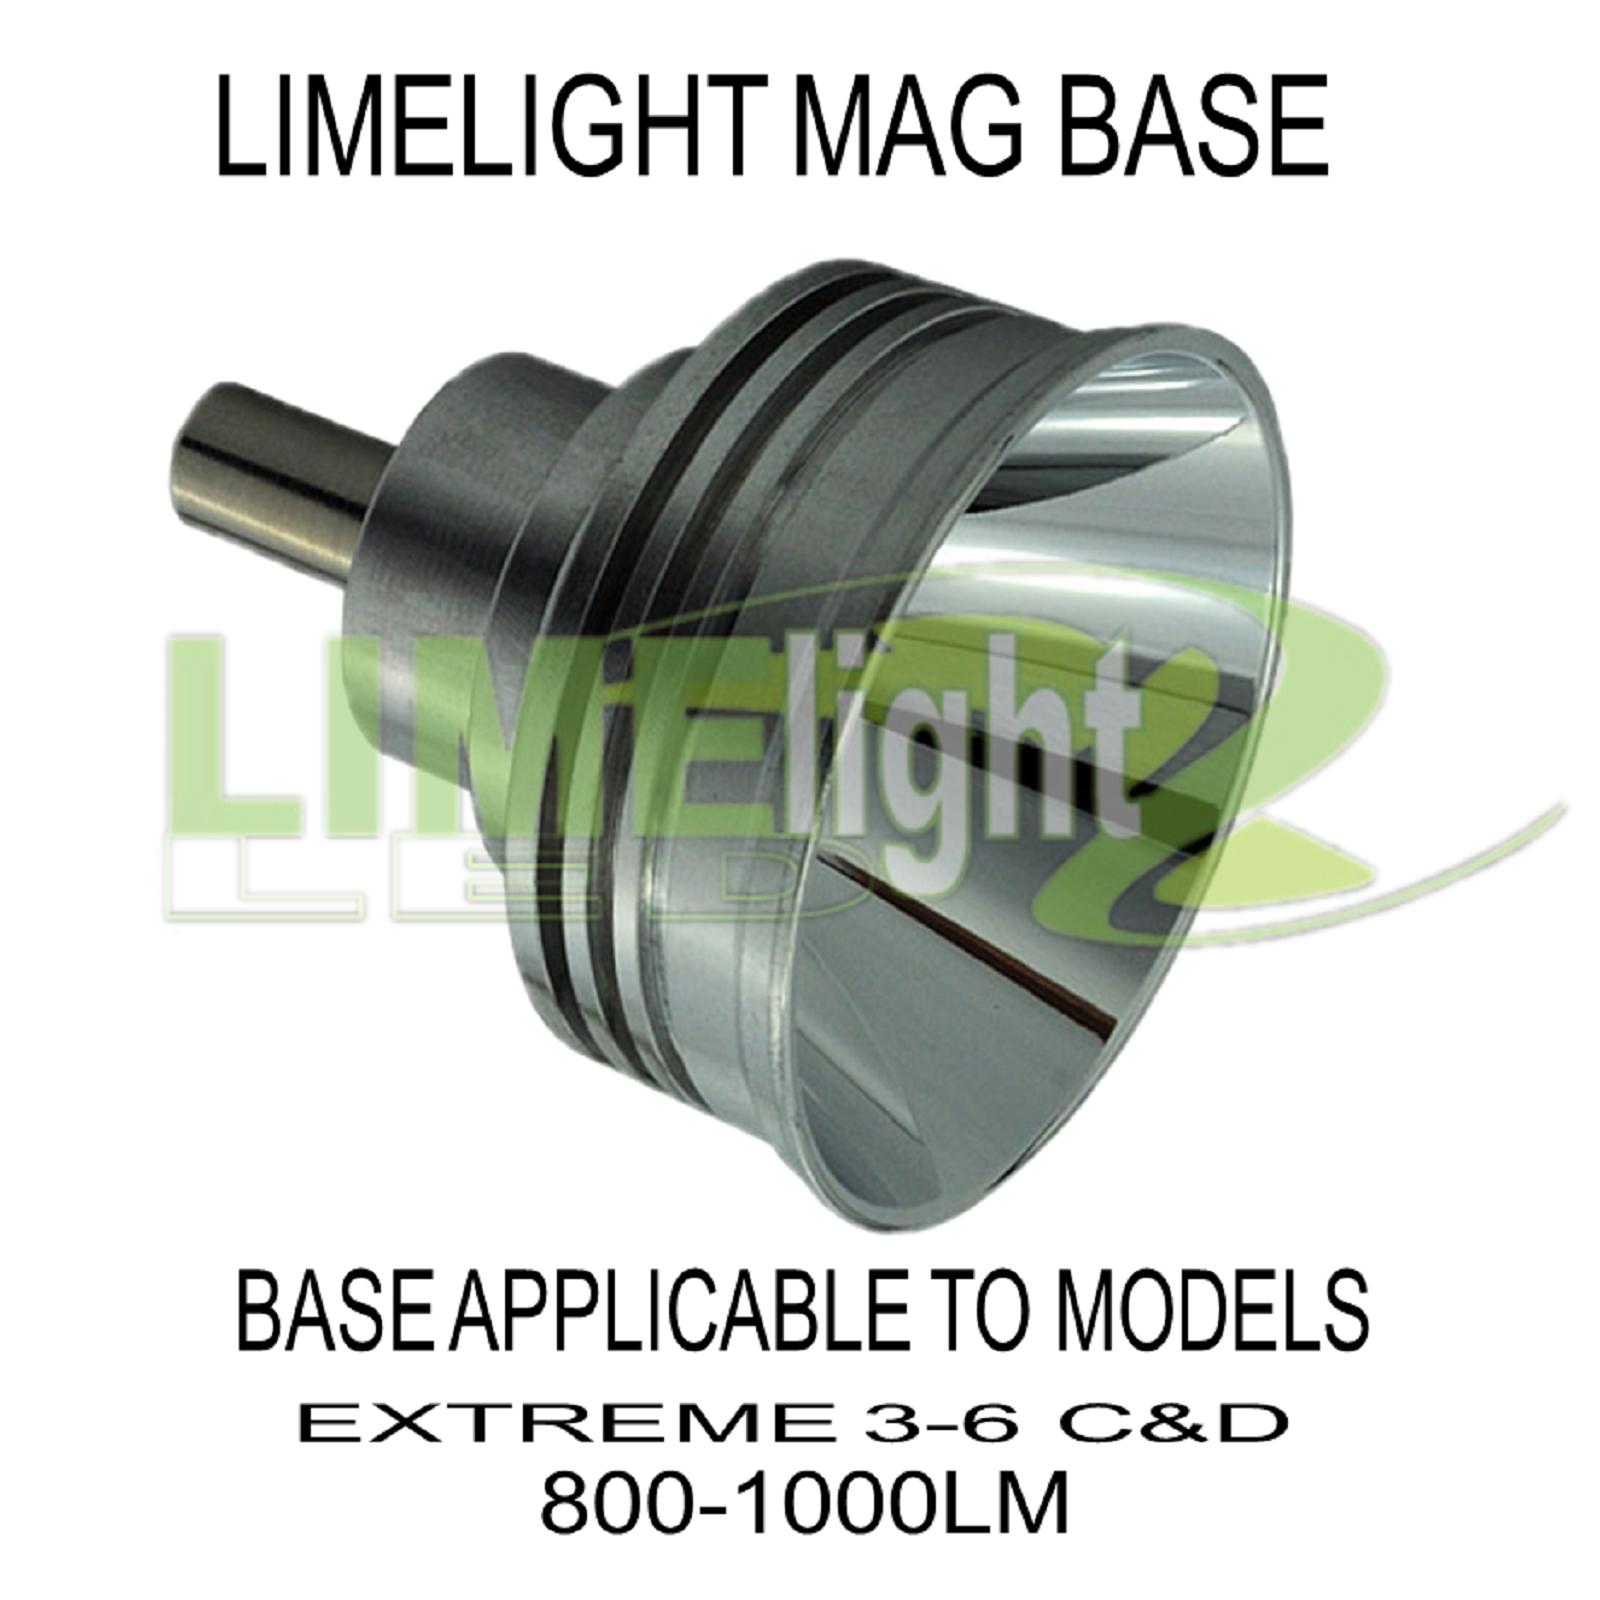 Maglite Led Upgrade Conversion Cree 1W-10W Bulb Globe Flashlight Torch 90-1100Lm 7